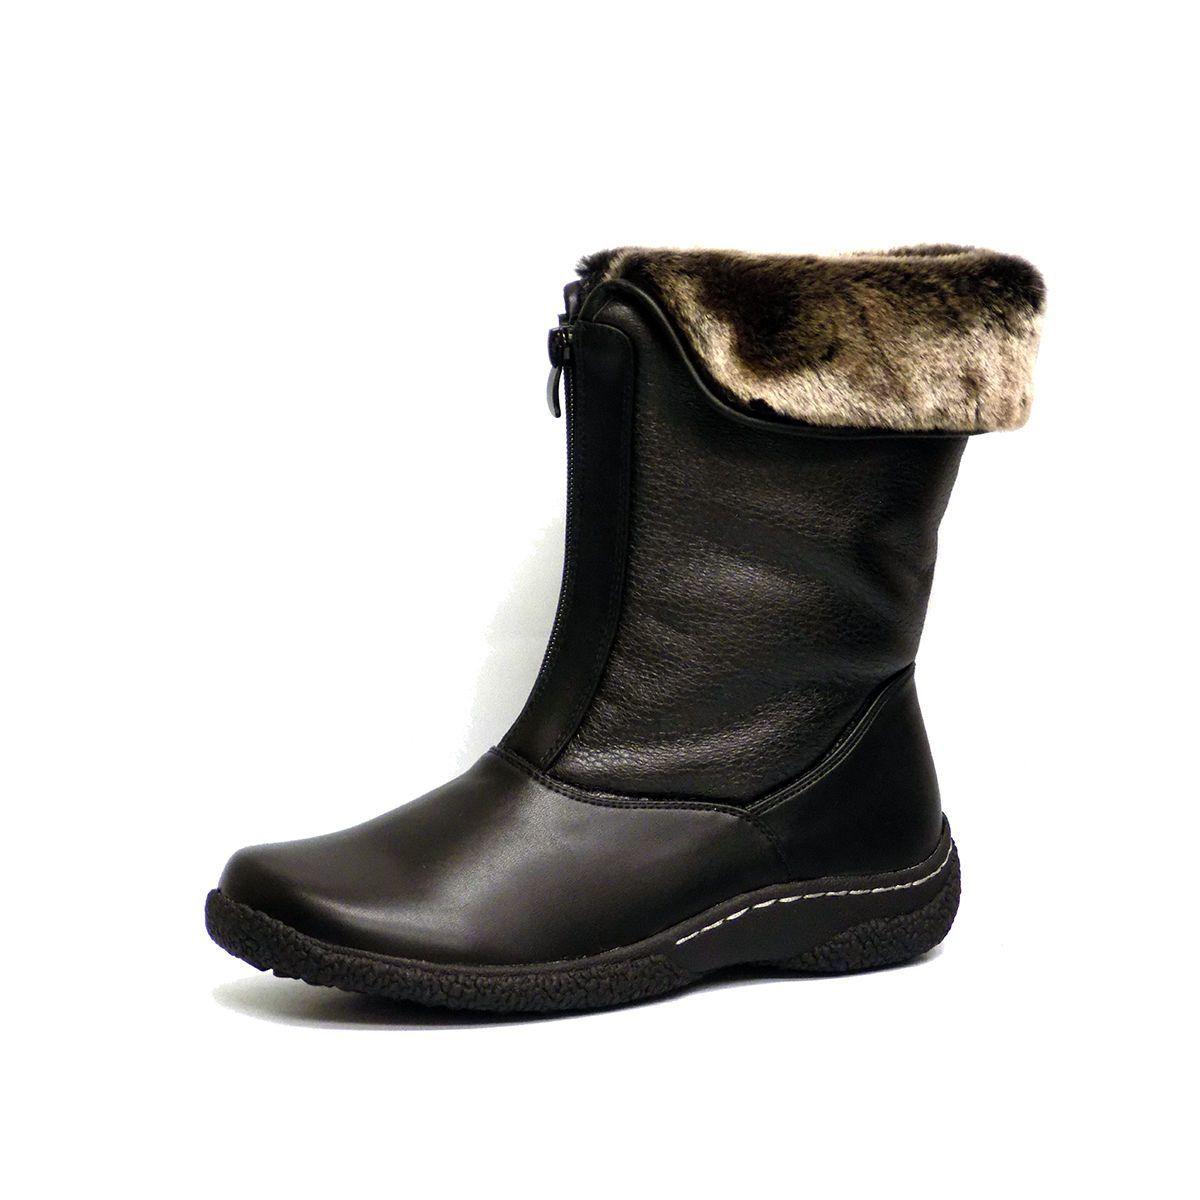 Wanderlust Gailee Womens Black Warm Lined Zip Up Weather Resistant Winter  Boots b3f833ceabda